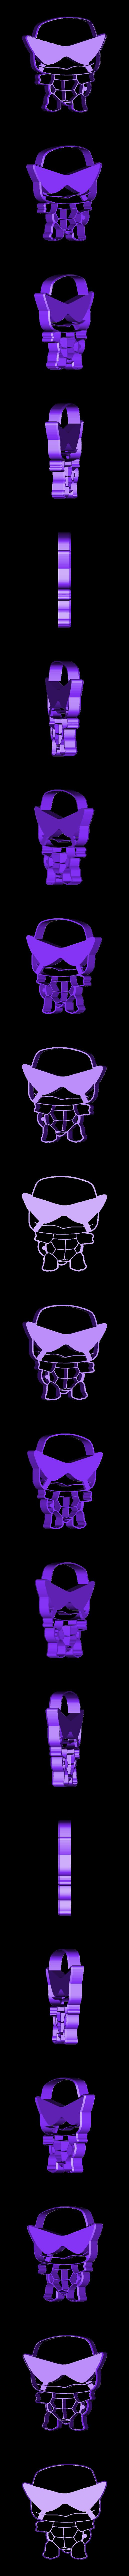 3D-01062 - CHIBI SQUIRTTLE COOKIE CUTTER.stl Descargar archivo STL Ardilla Chibi • Plan para la impresión en 3D, 3DPrintersaur